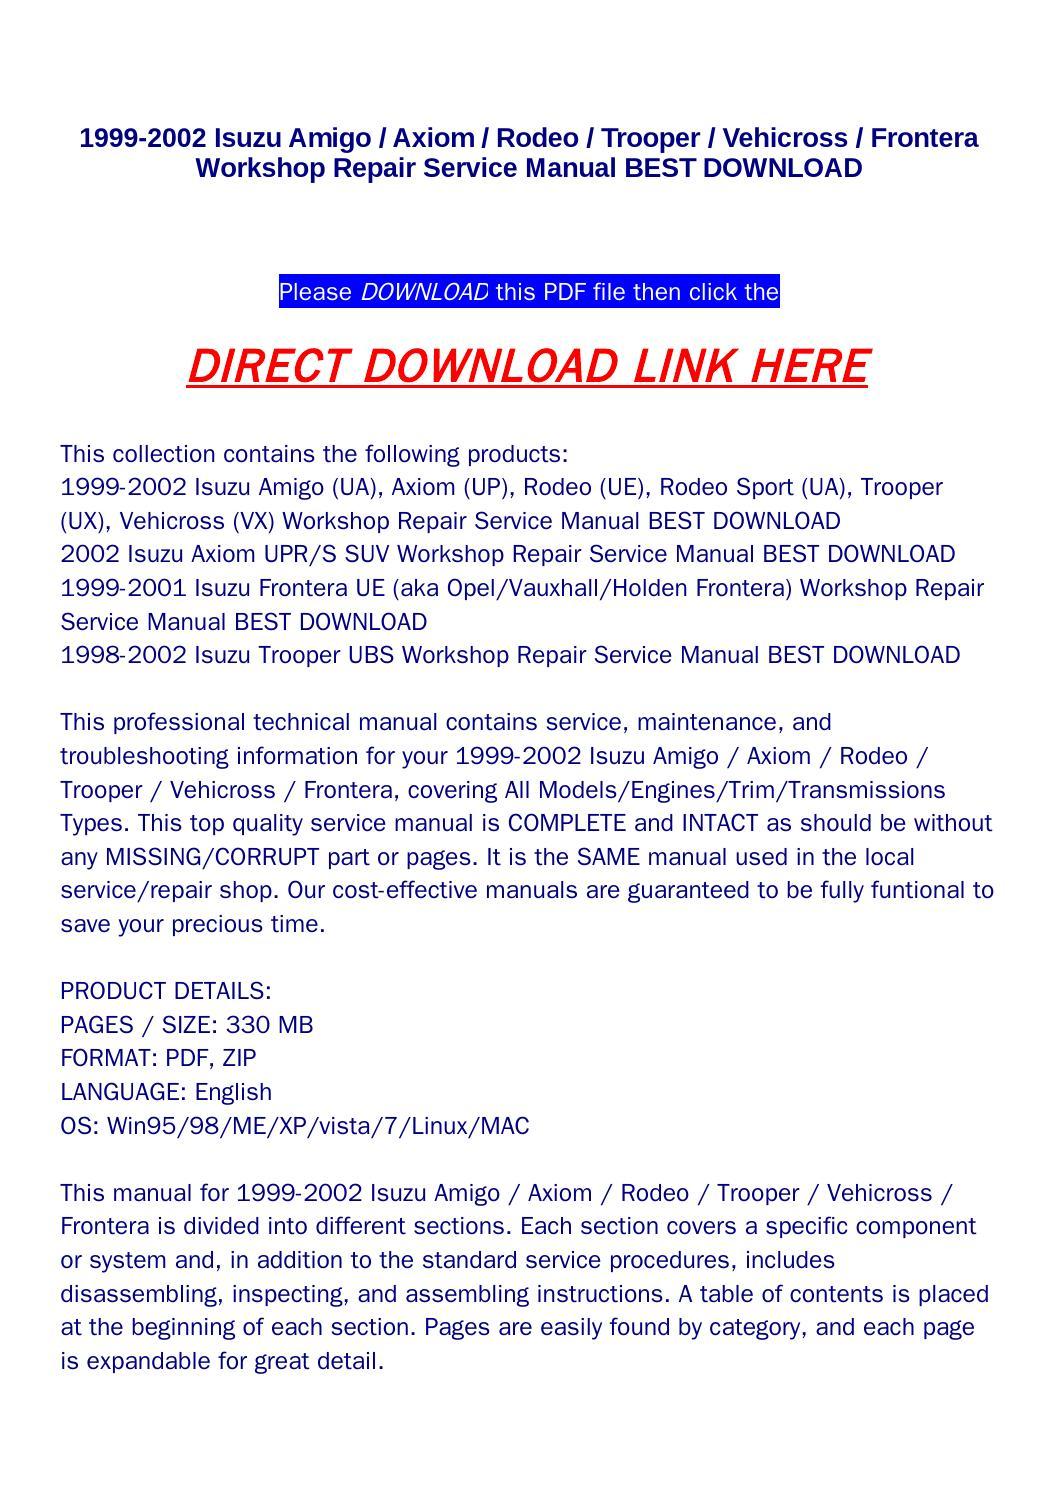 hight resolution of 1999 2002 isuzu amigo axiom rodeo trooper vehicross frontera workshop repair service manual best dow